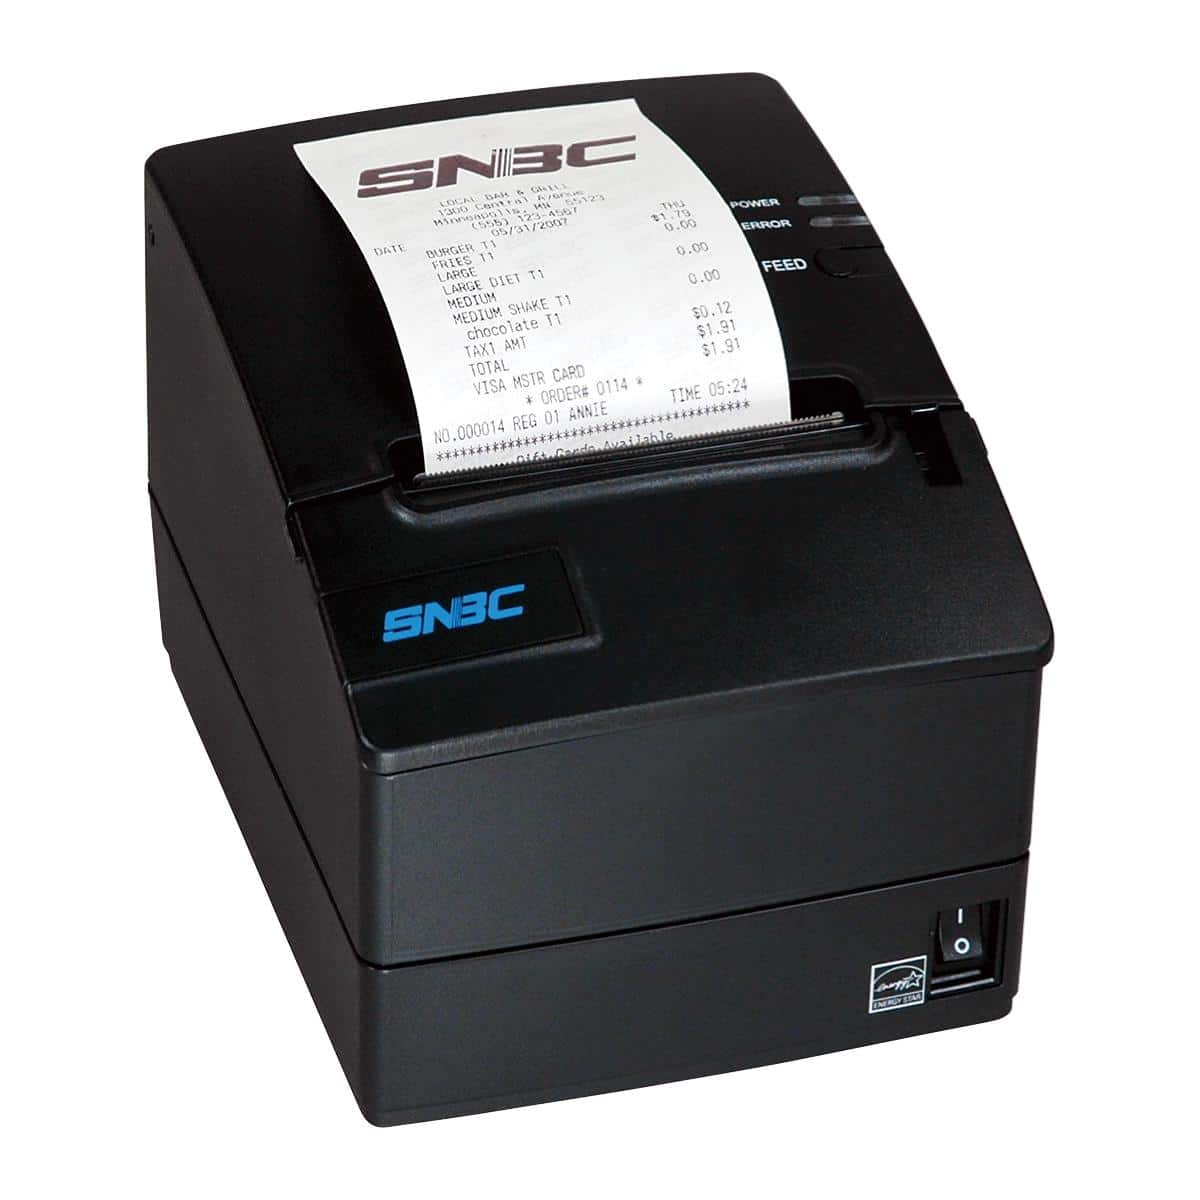 SNBC Printer BTP-R180II USB+Serial+Ethernet| JaimePOS A Leading POS & Merchant Services Provider